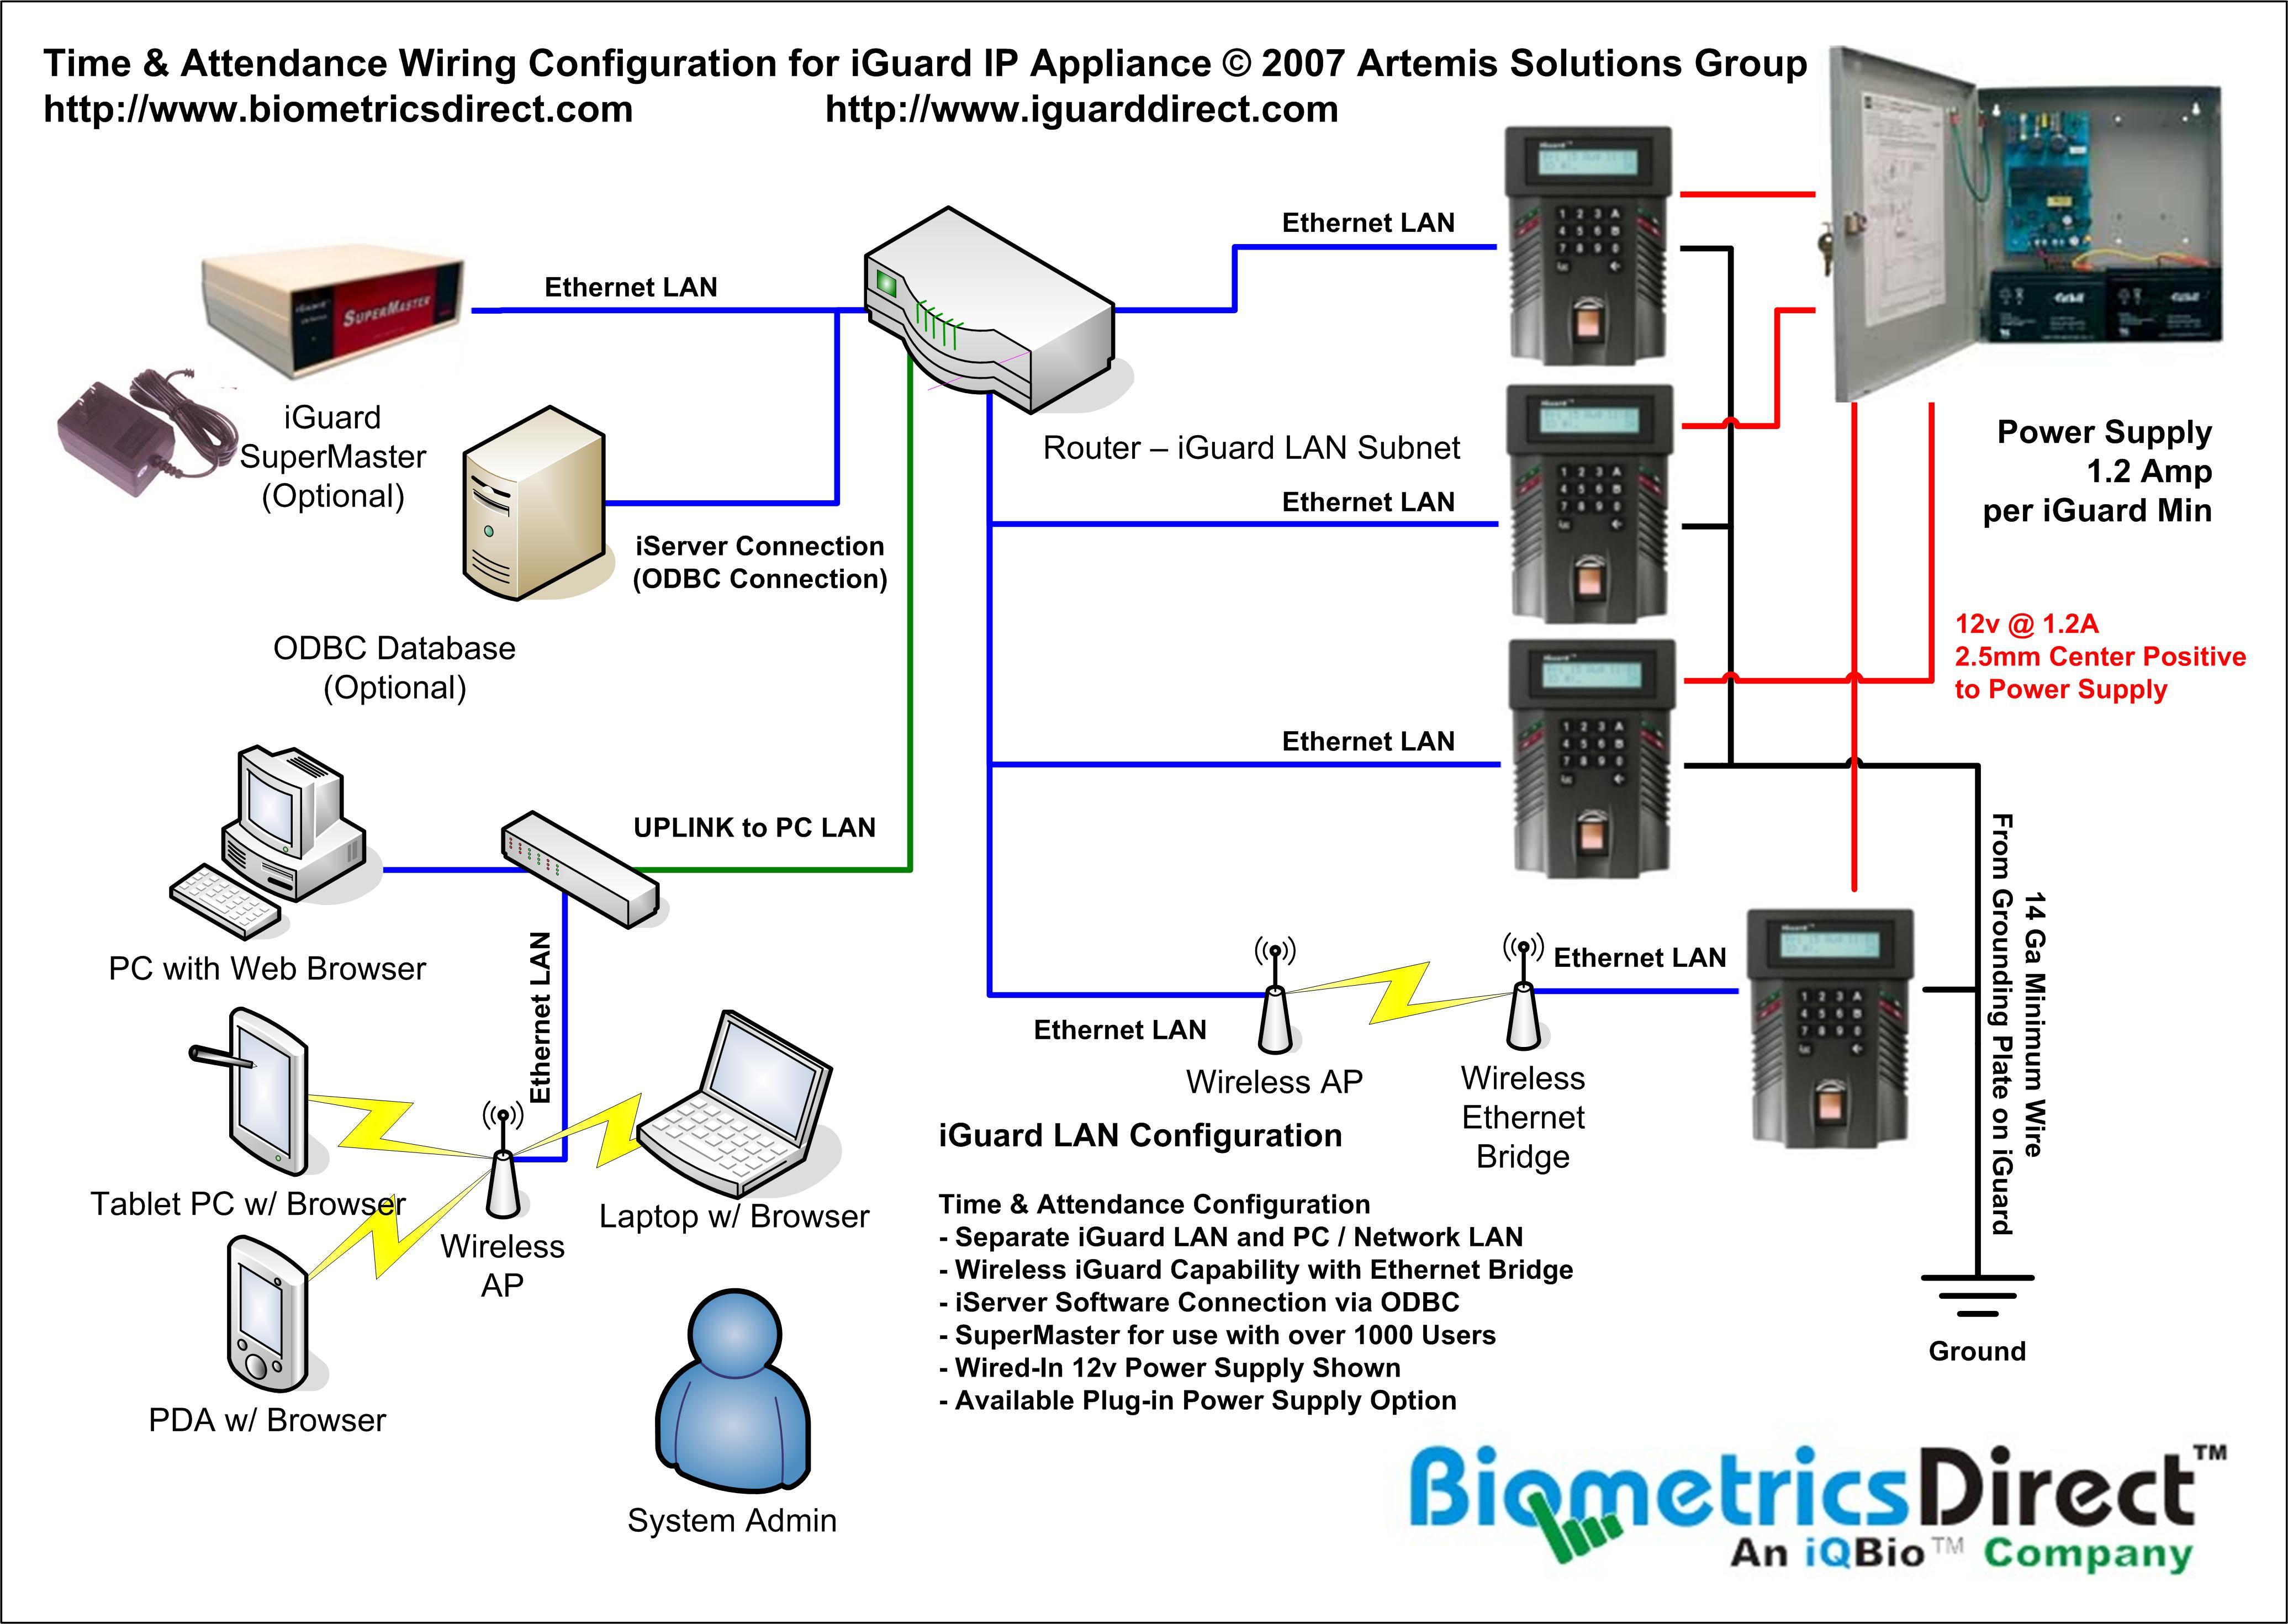 2003 f150 speaker wiring diagram 1998 ford f150 speaker wiring diagram iguard lm530 sc smart card only master or slave #11